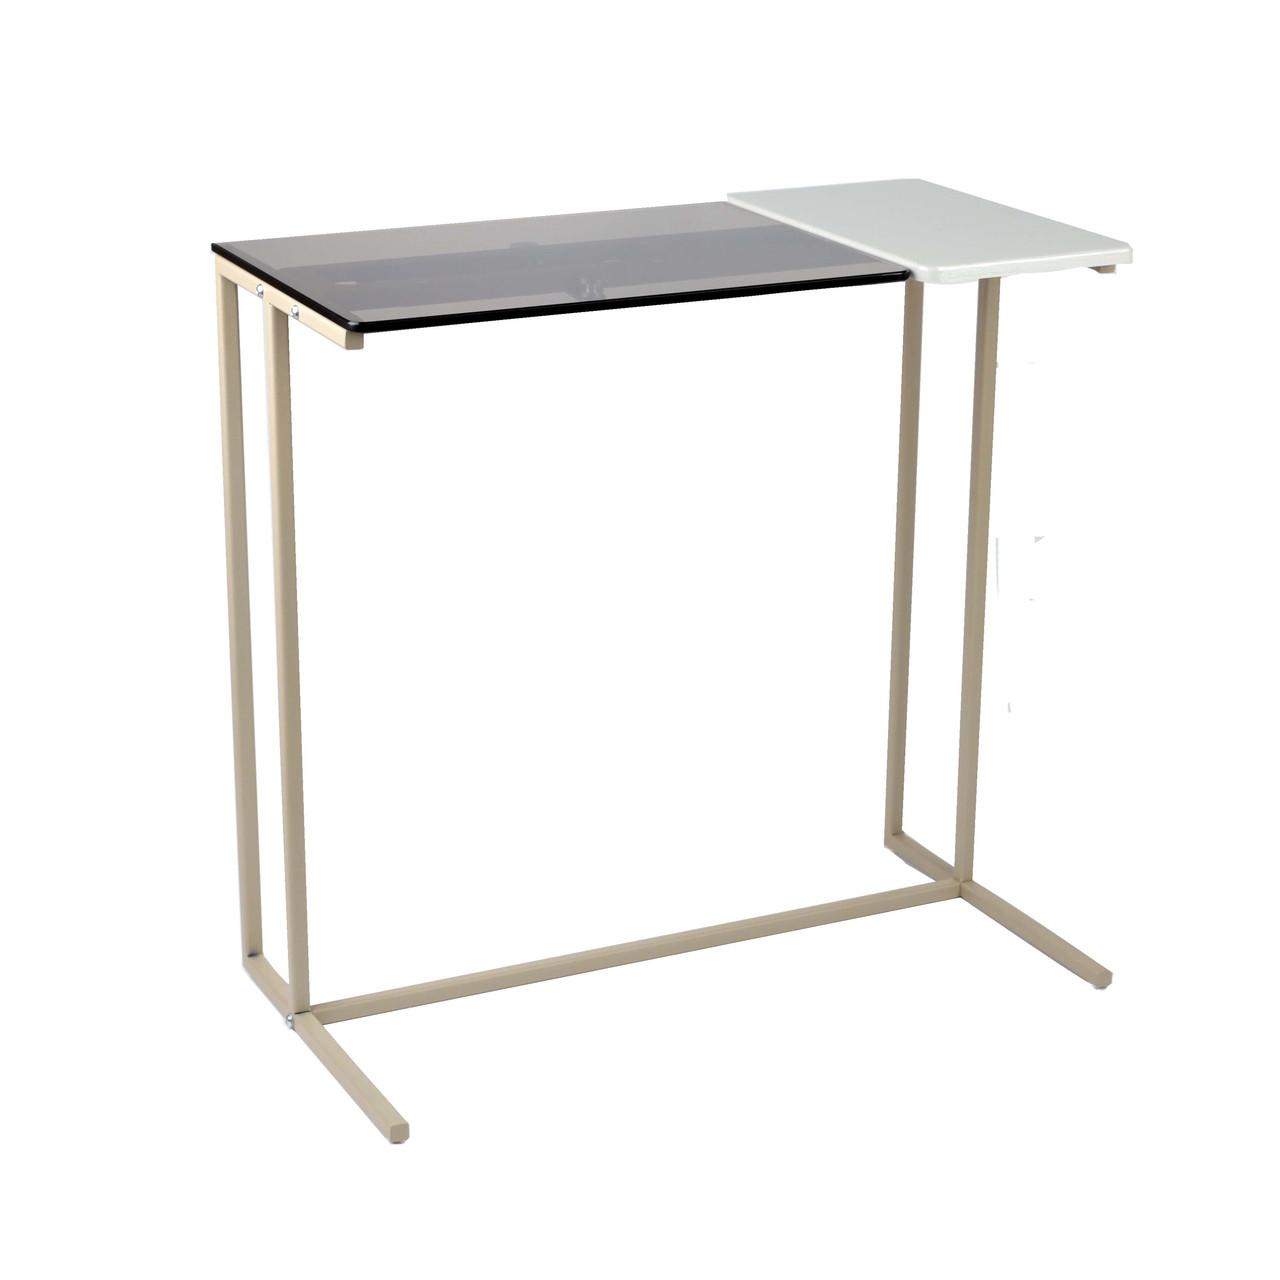 Стол приставной для предметов комфорта и IT-техники Commus Comfort A600 bronze 8/white/beige